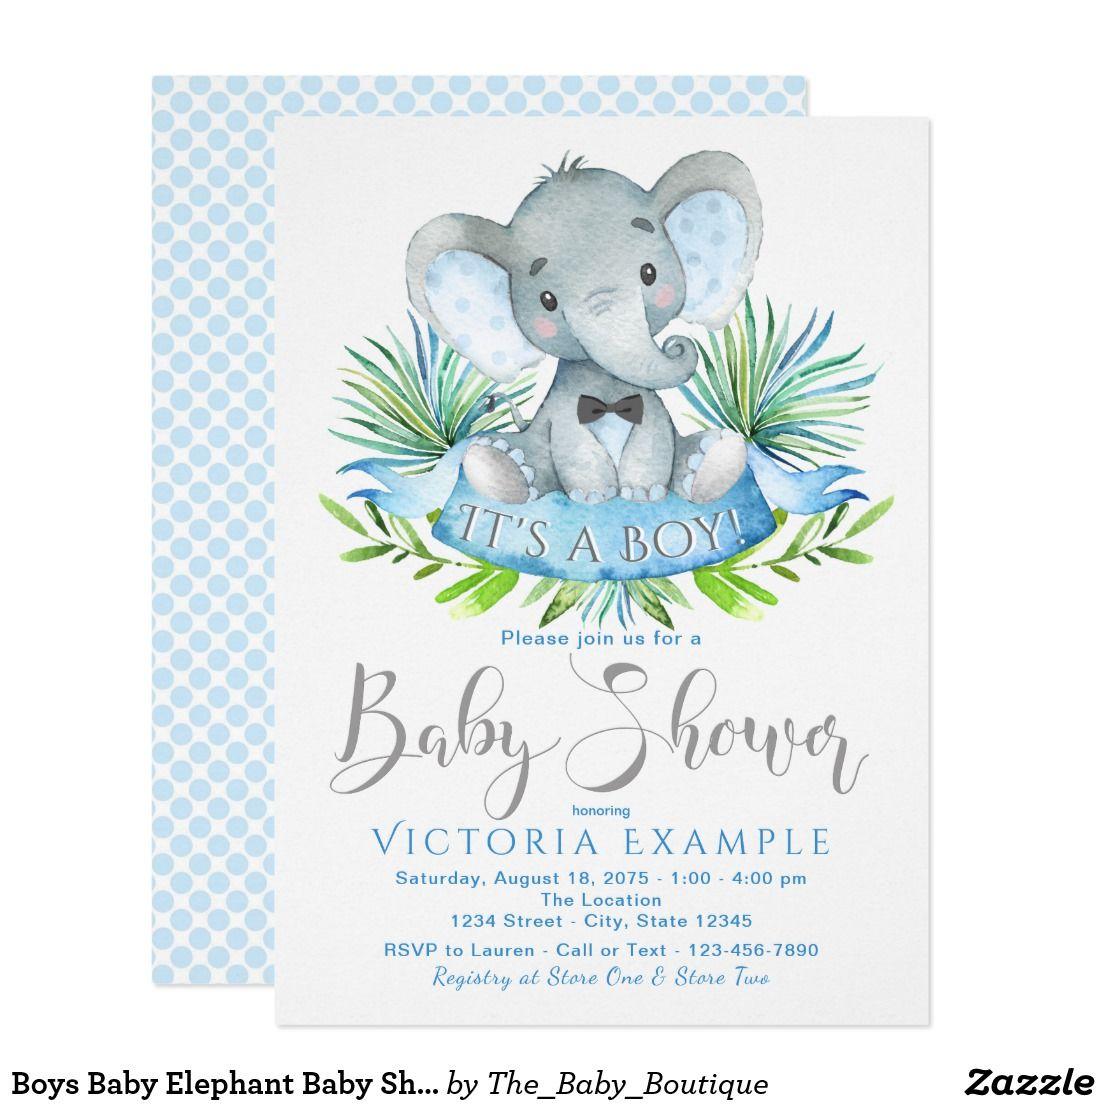 Boys Baby Elephant Baby Shower Invitations   Elephant baby showers ...